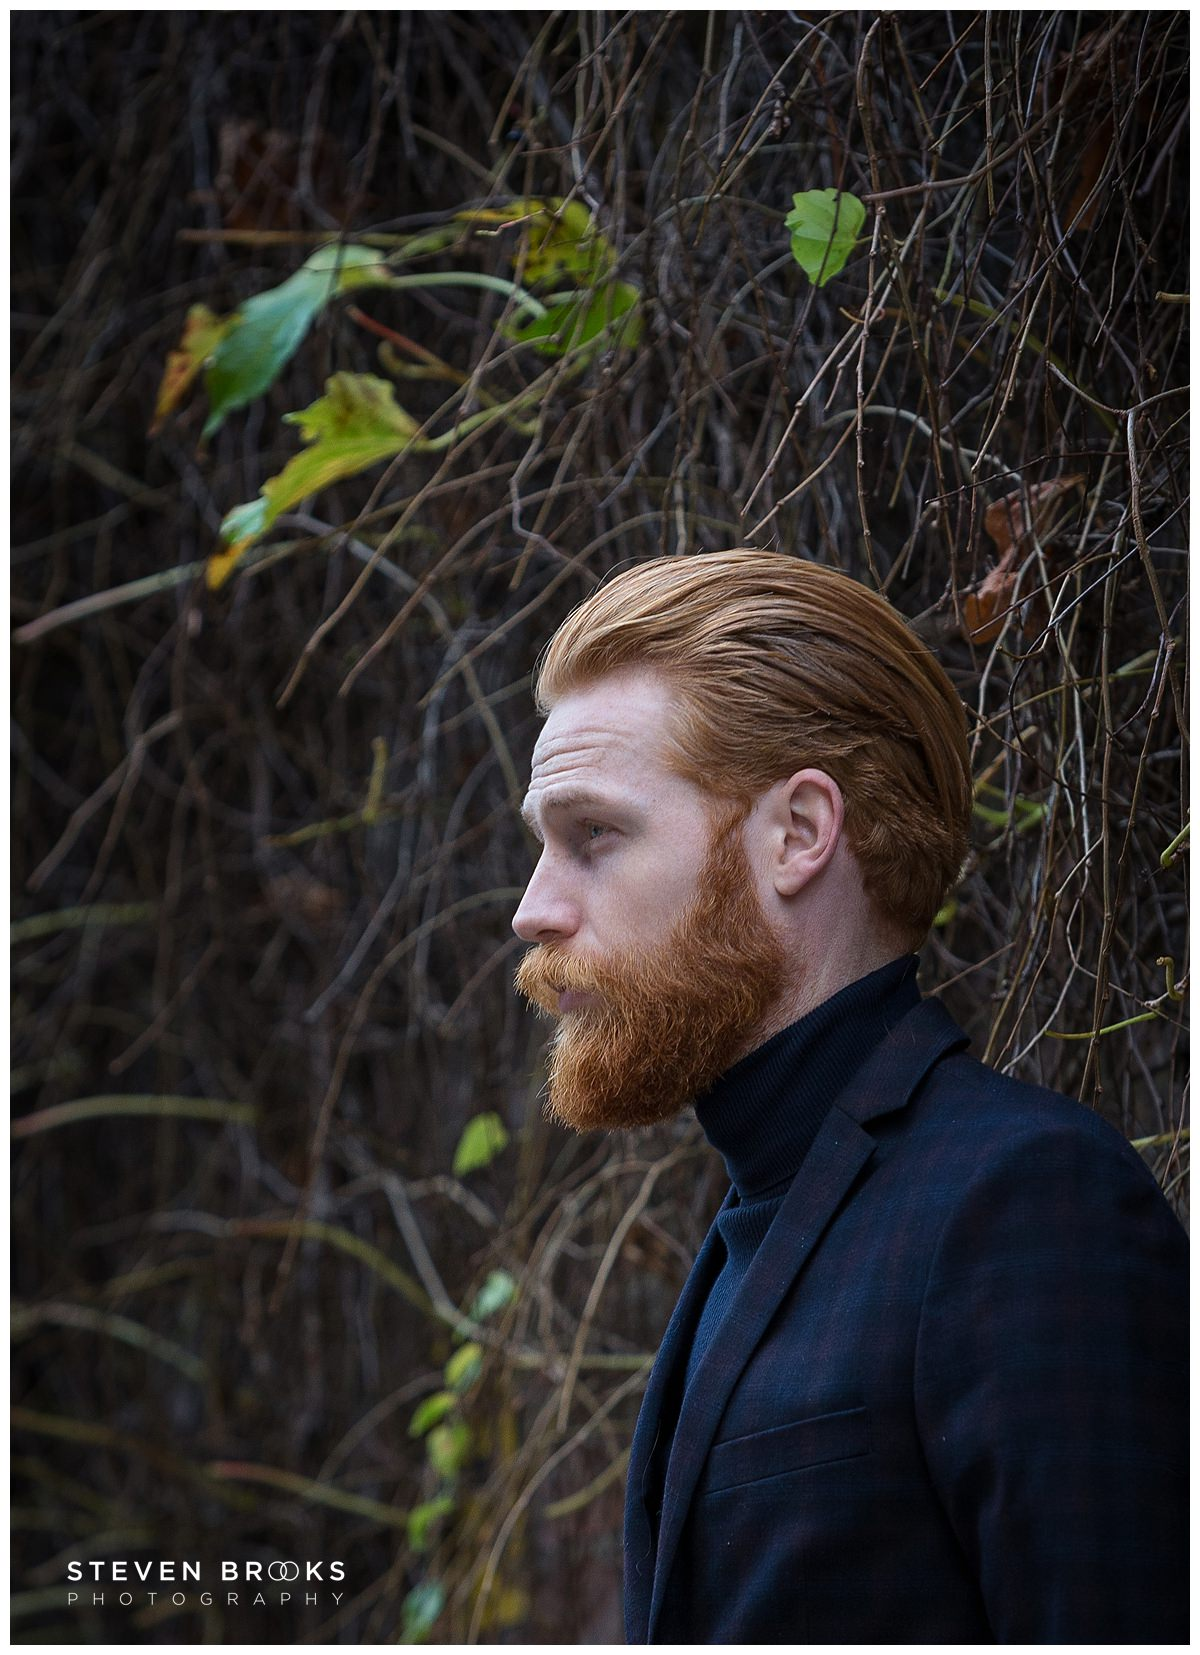 Gwilym Pugh Fashion Photography Shoot_0002